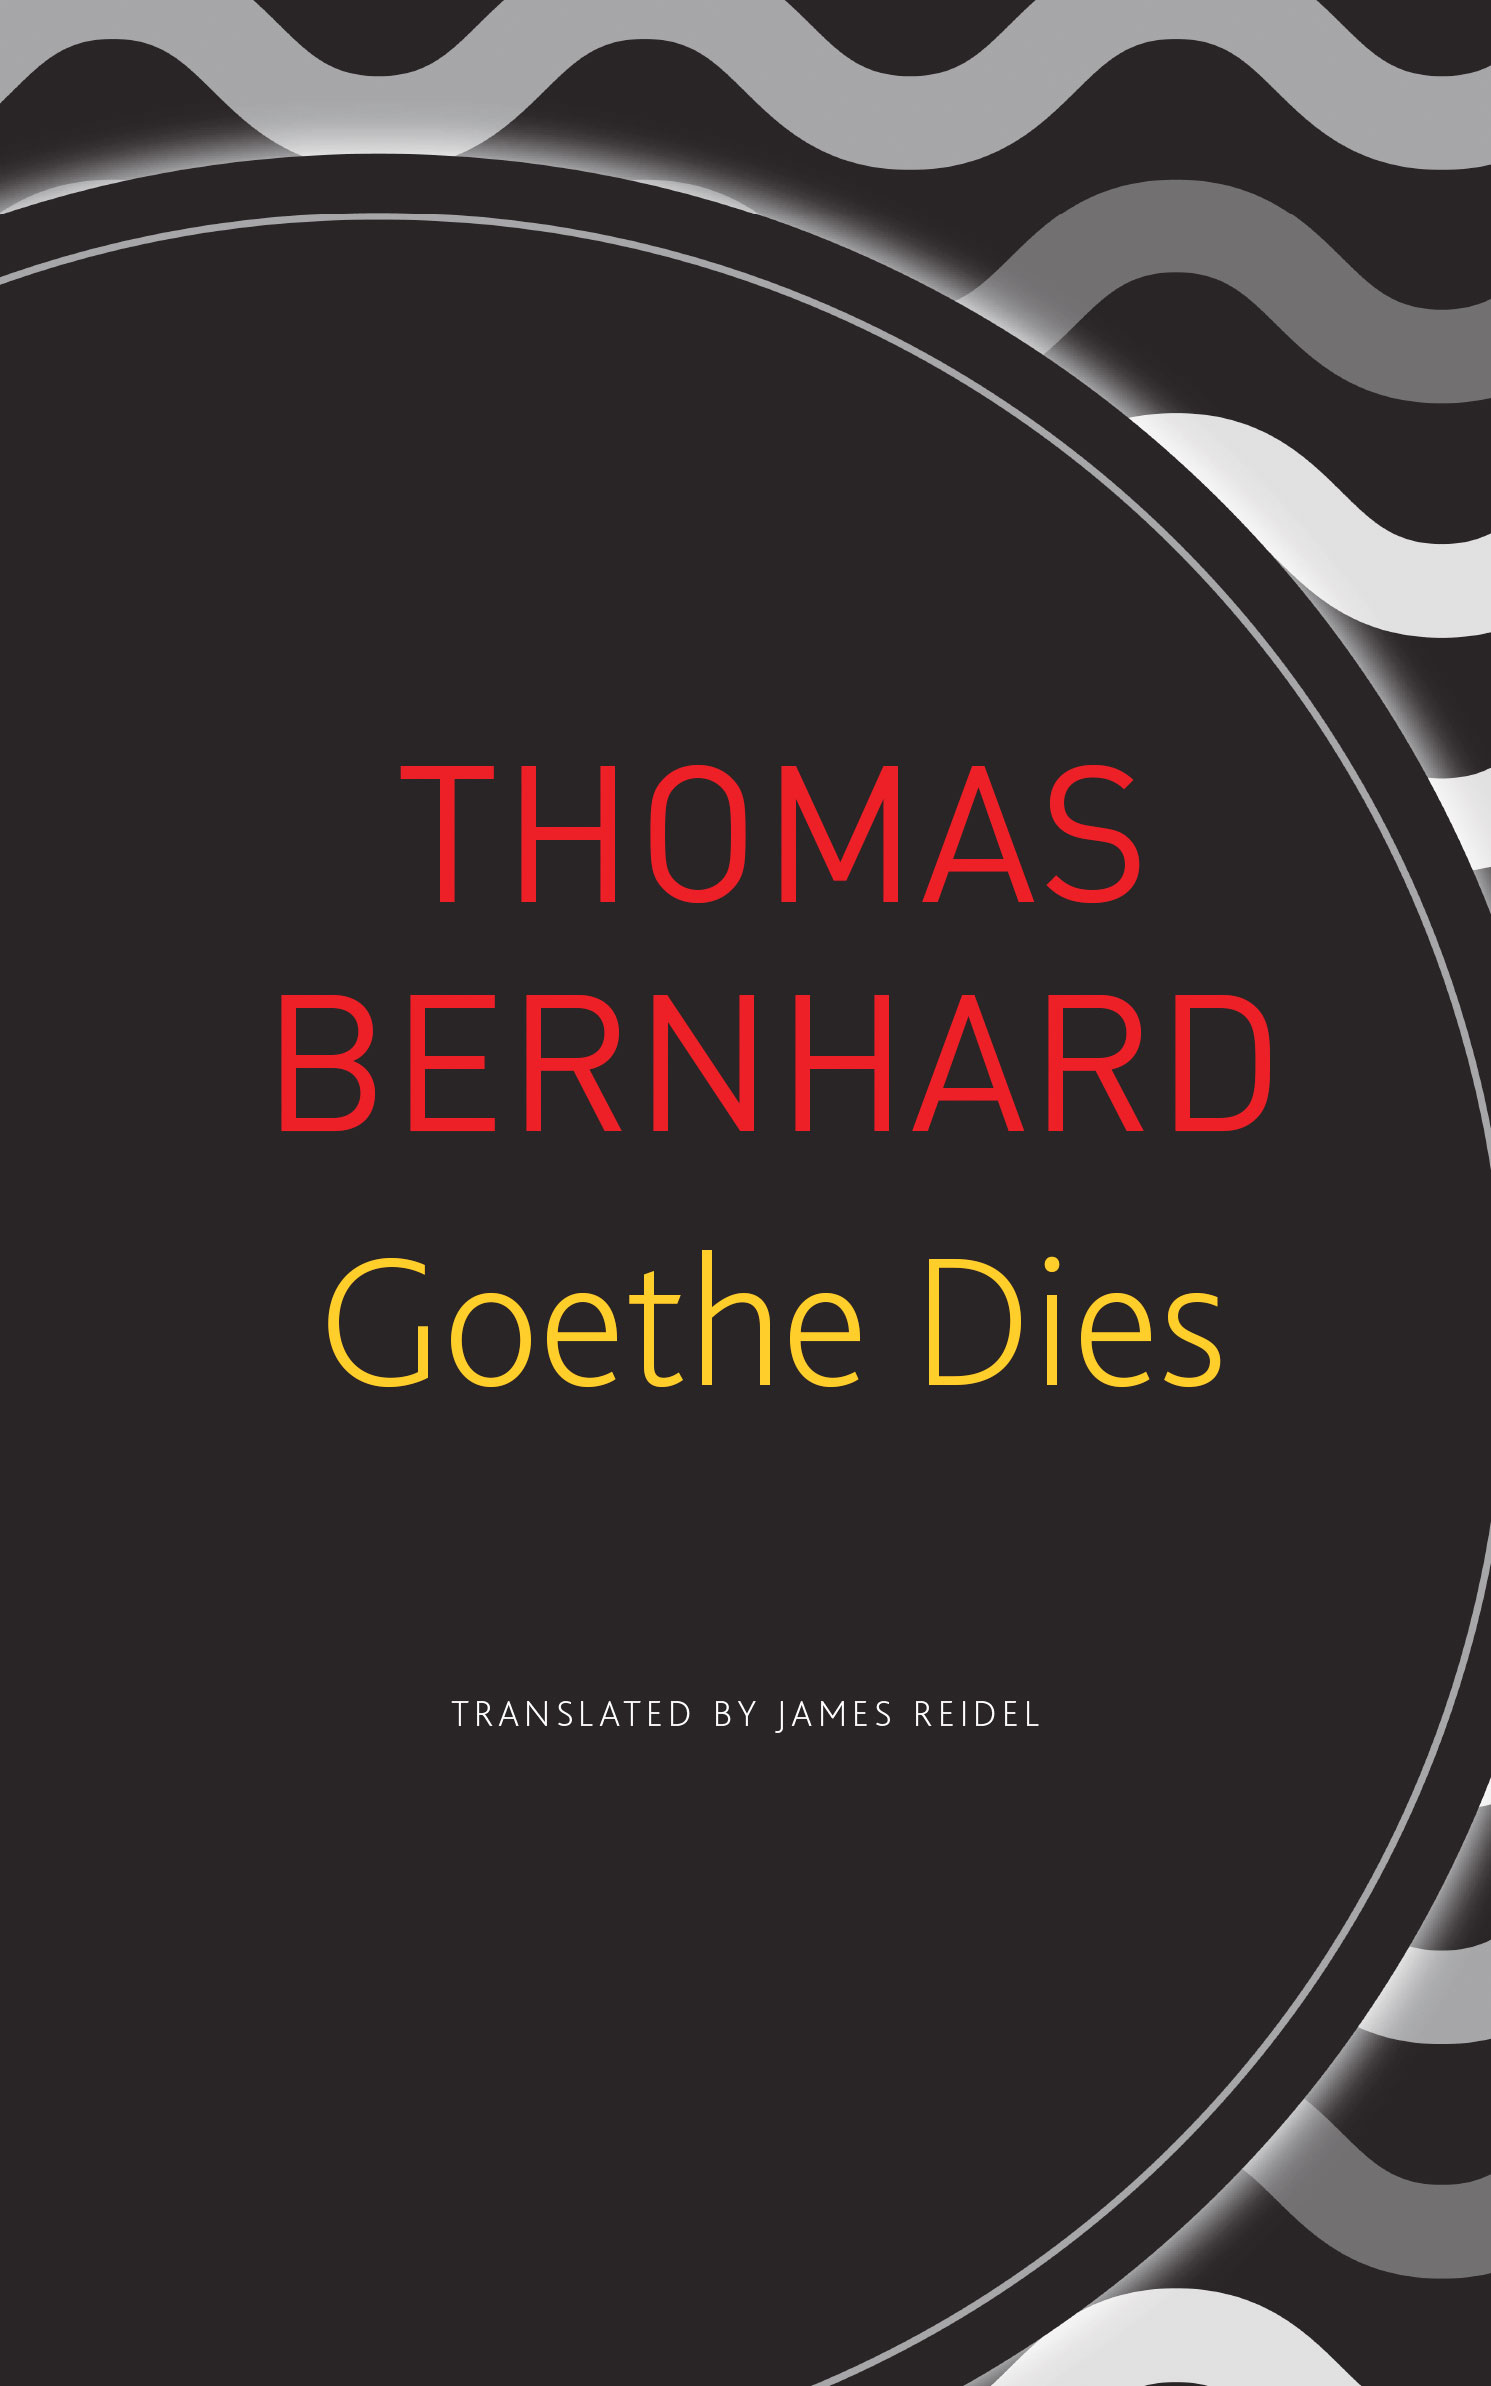 Goethe Dies by Thomas Bernhard | Seagull Books